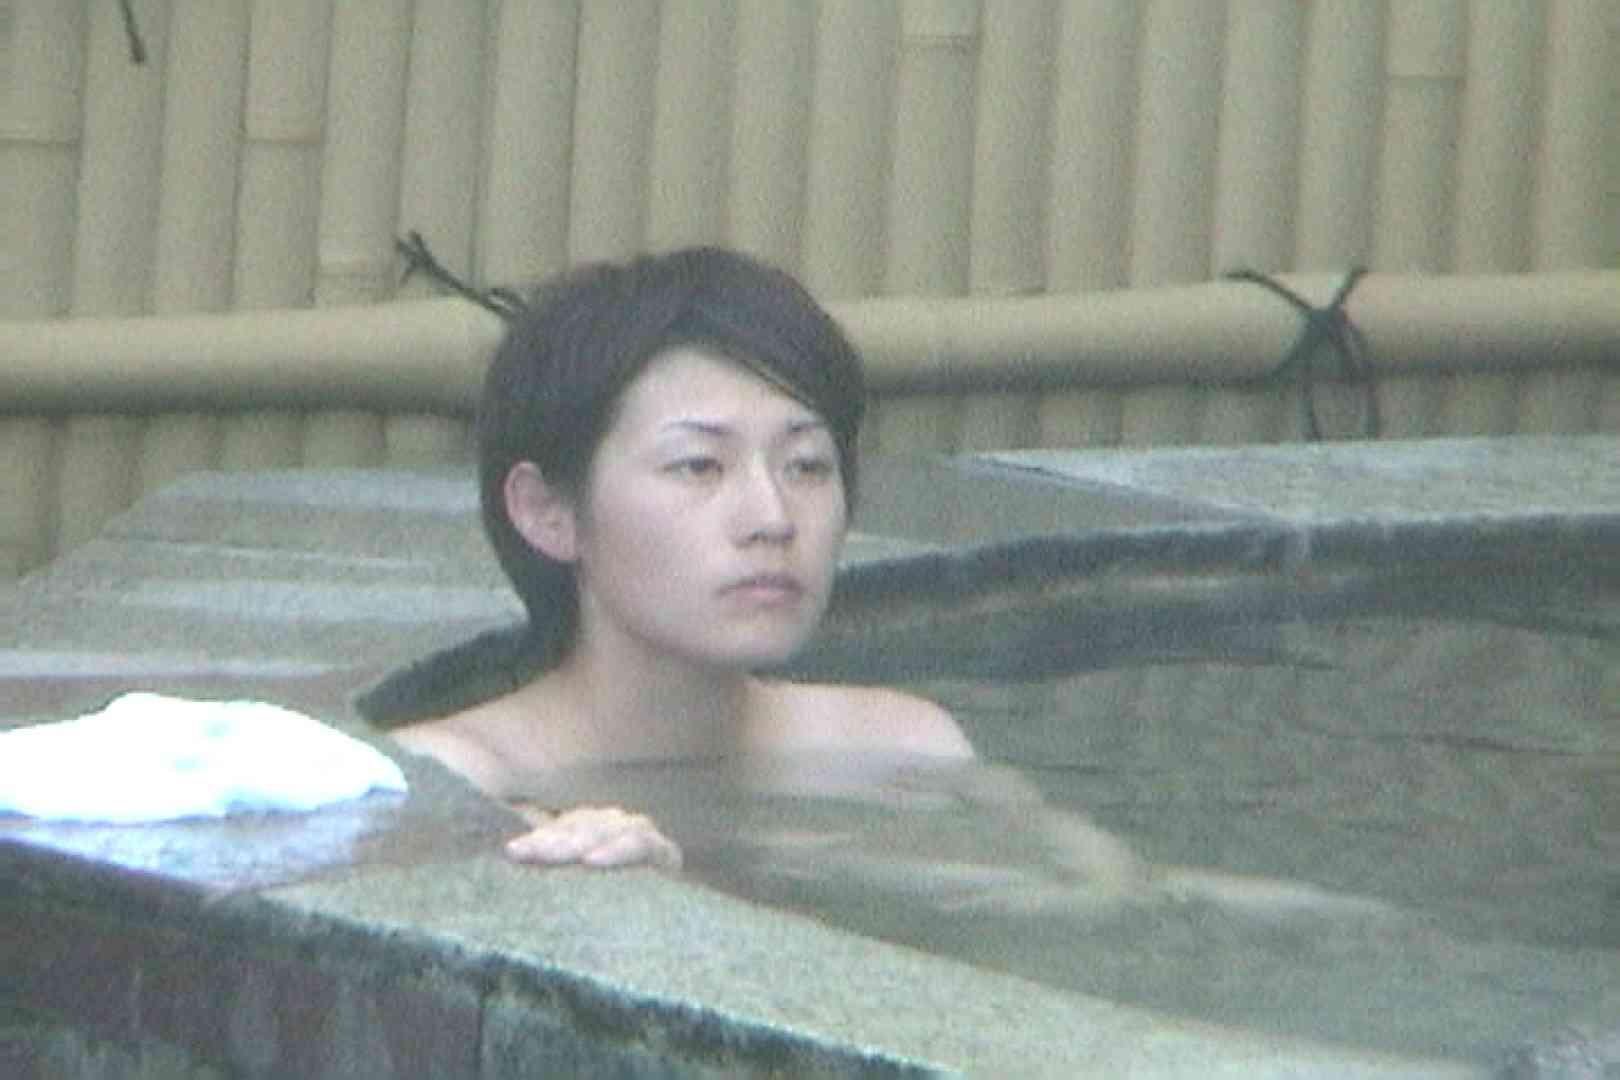 Aquaな露天風呂Vol.100【VIP限定】 盗撮シリーズ | 露天風呂編  105PIX 37